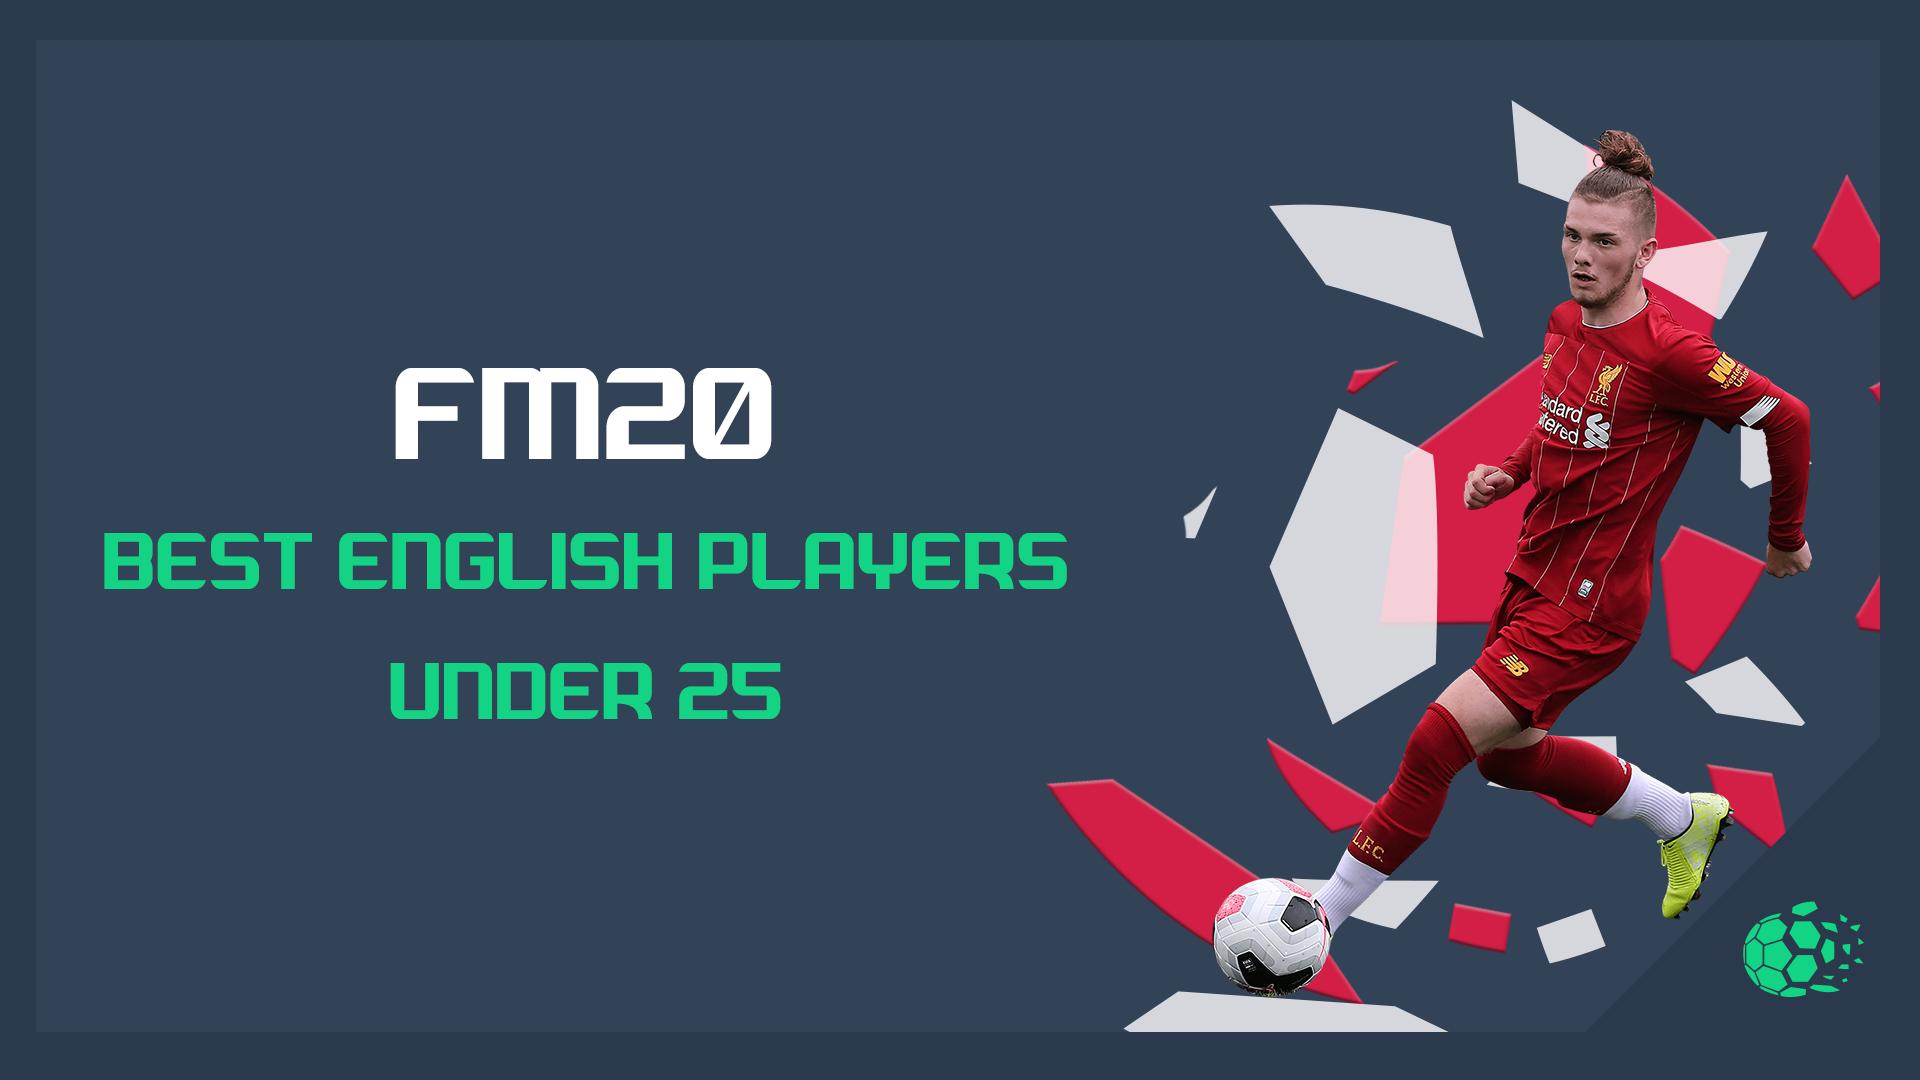 """FM20FM20: Best English Players Under 25"" feature image"